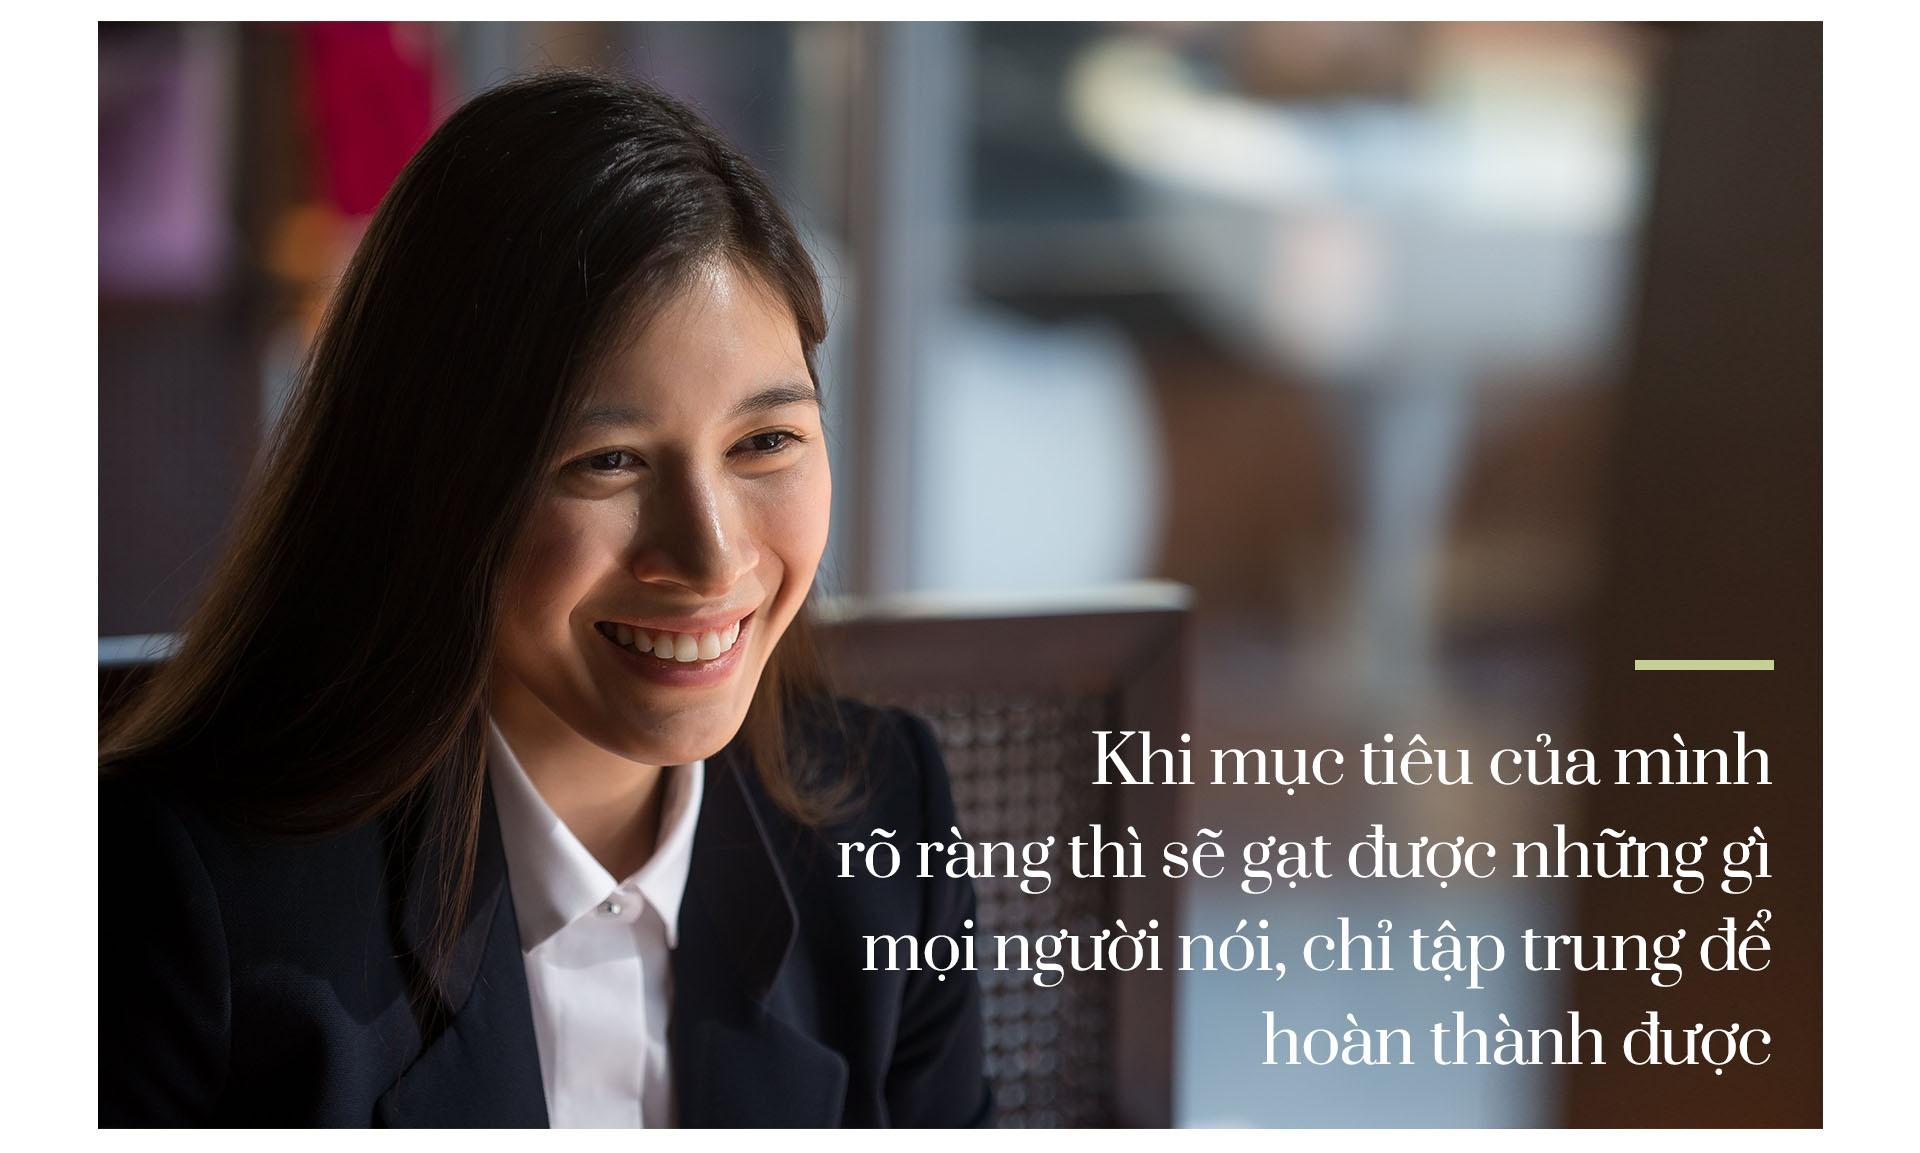 Nguyen Ngoc My: 'Toi khong phai nguoi showbiz, ma lam kinh doanh' hinh anh 12